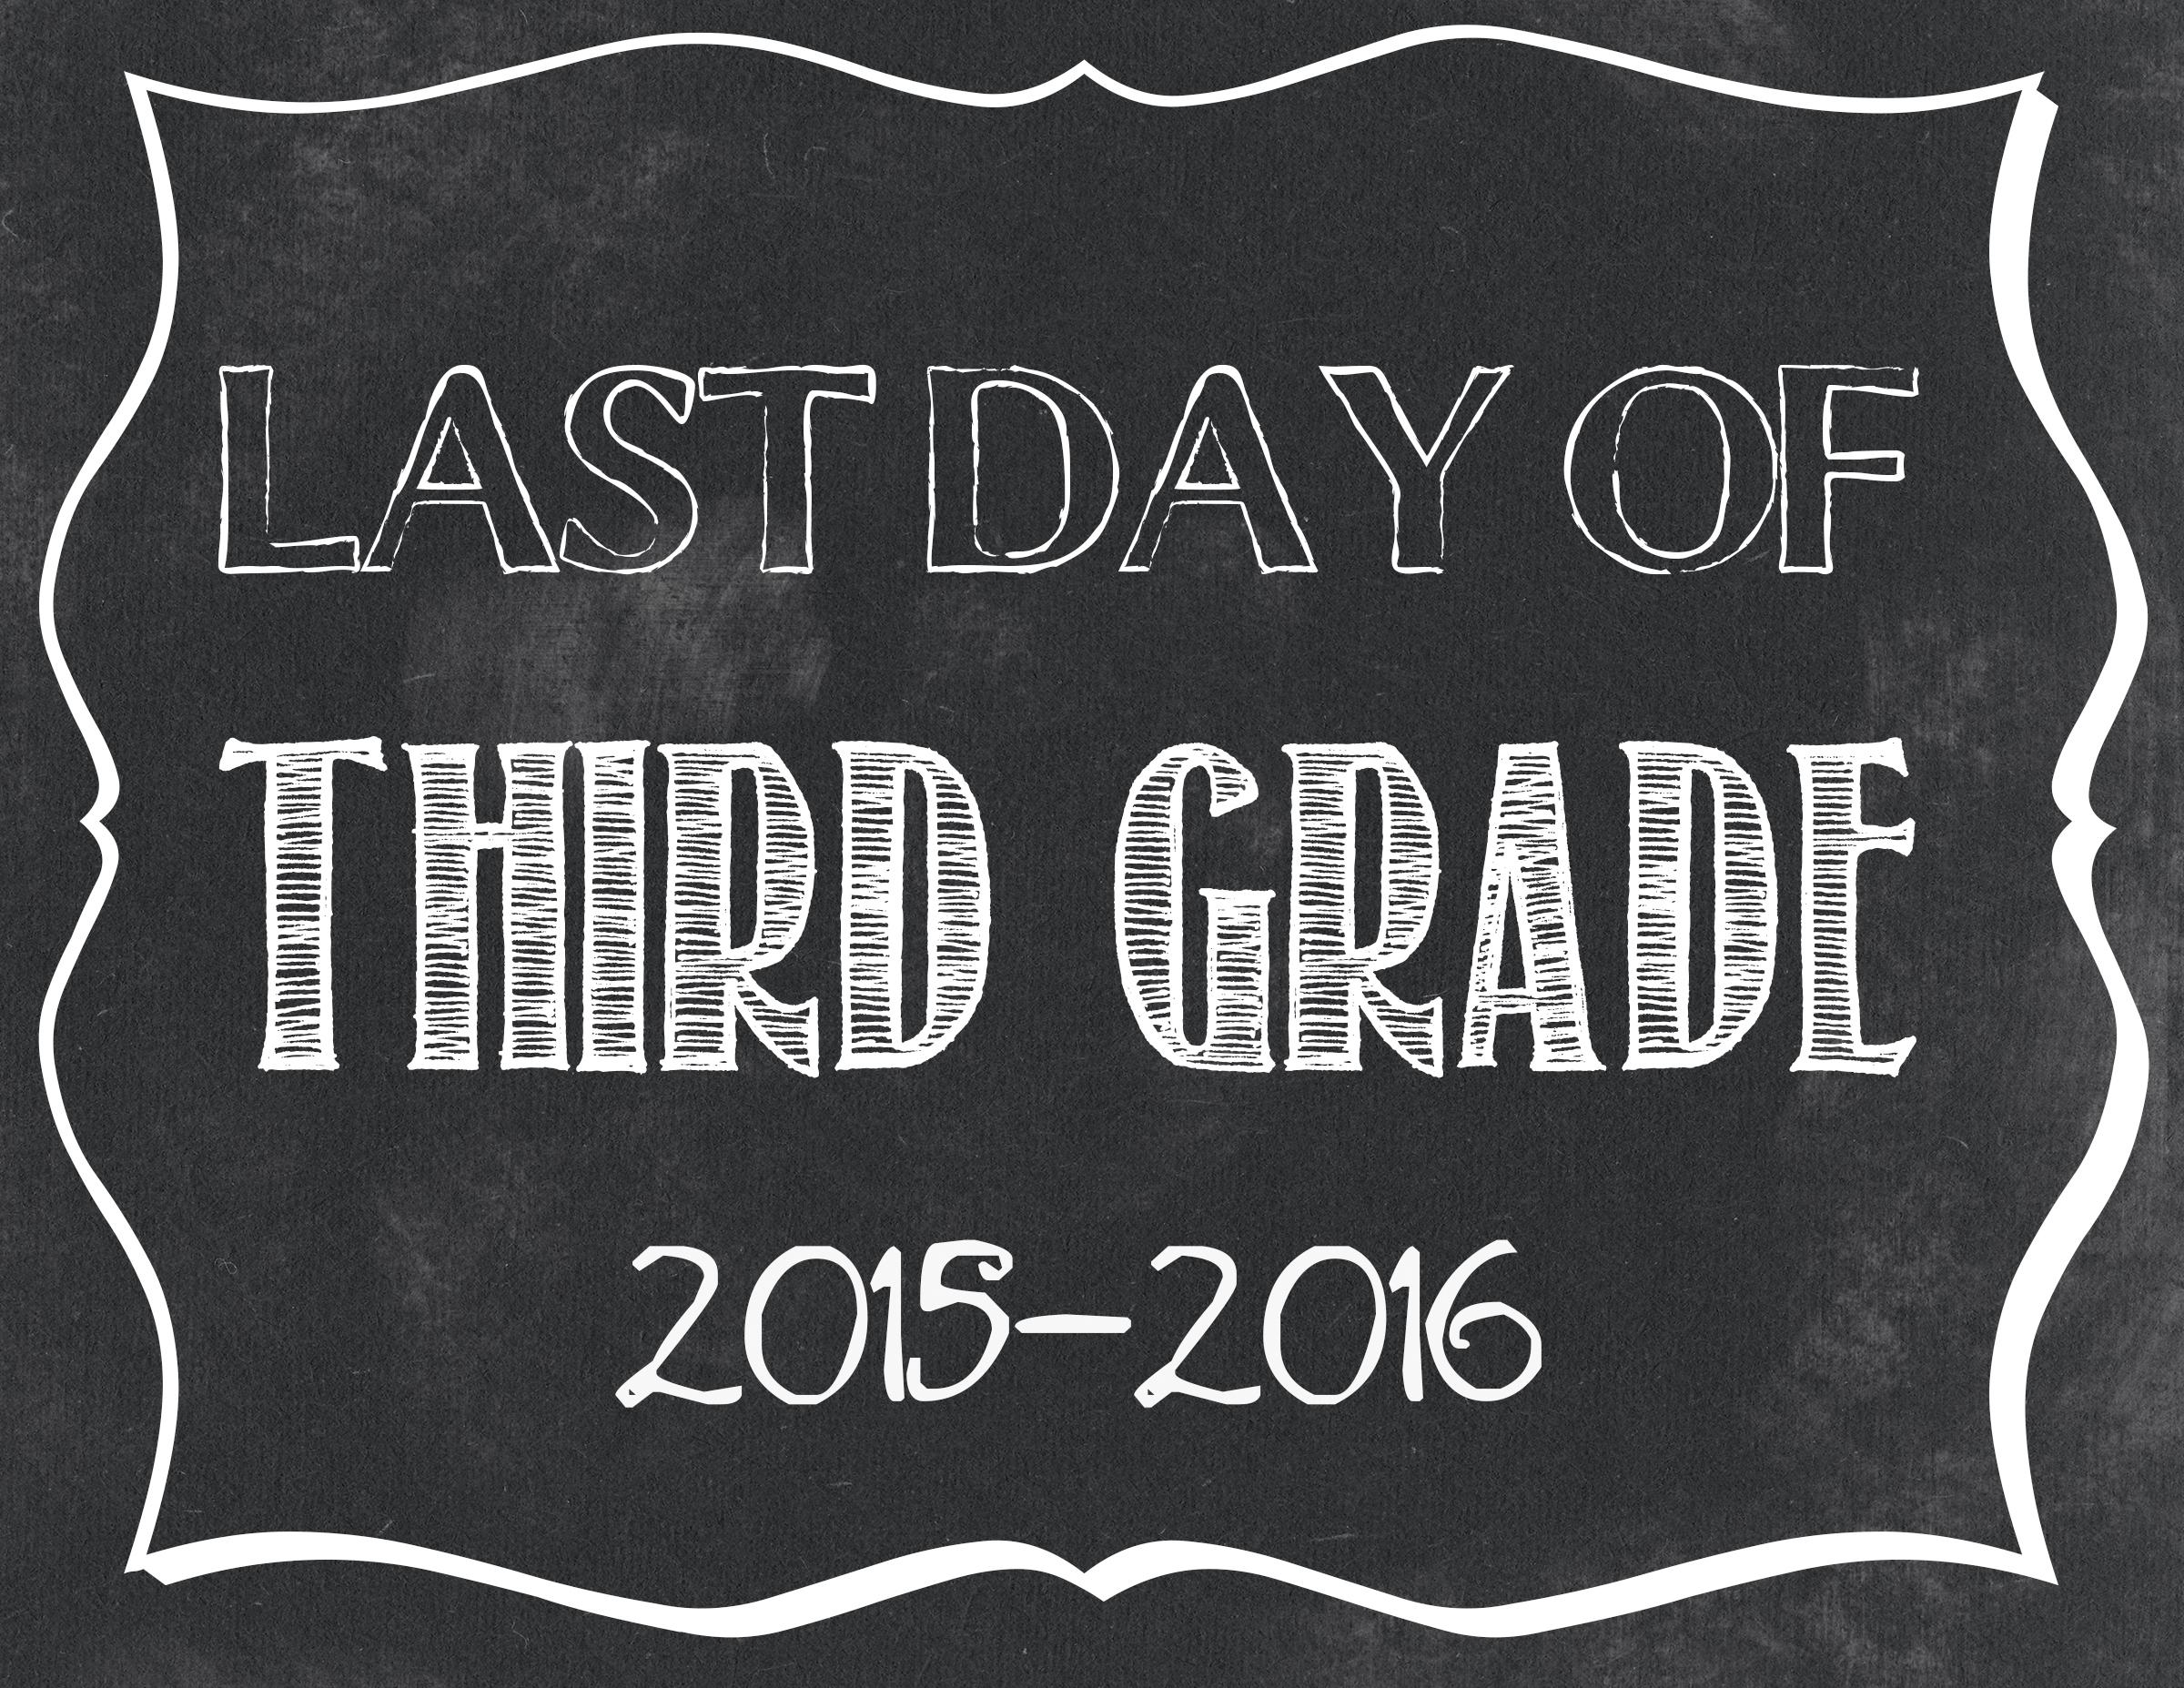 Last Day Of School Free Printables 2015-2016 - Classy Clutter - First Day Of Fourth Grade Free Printable